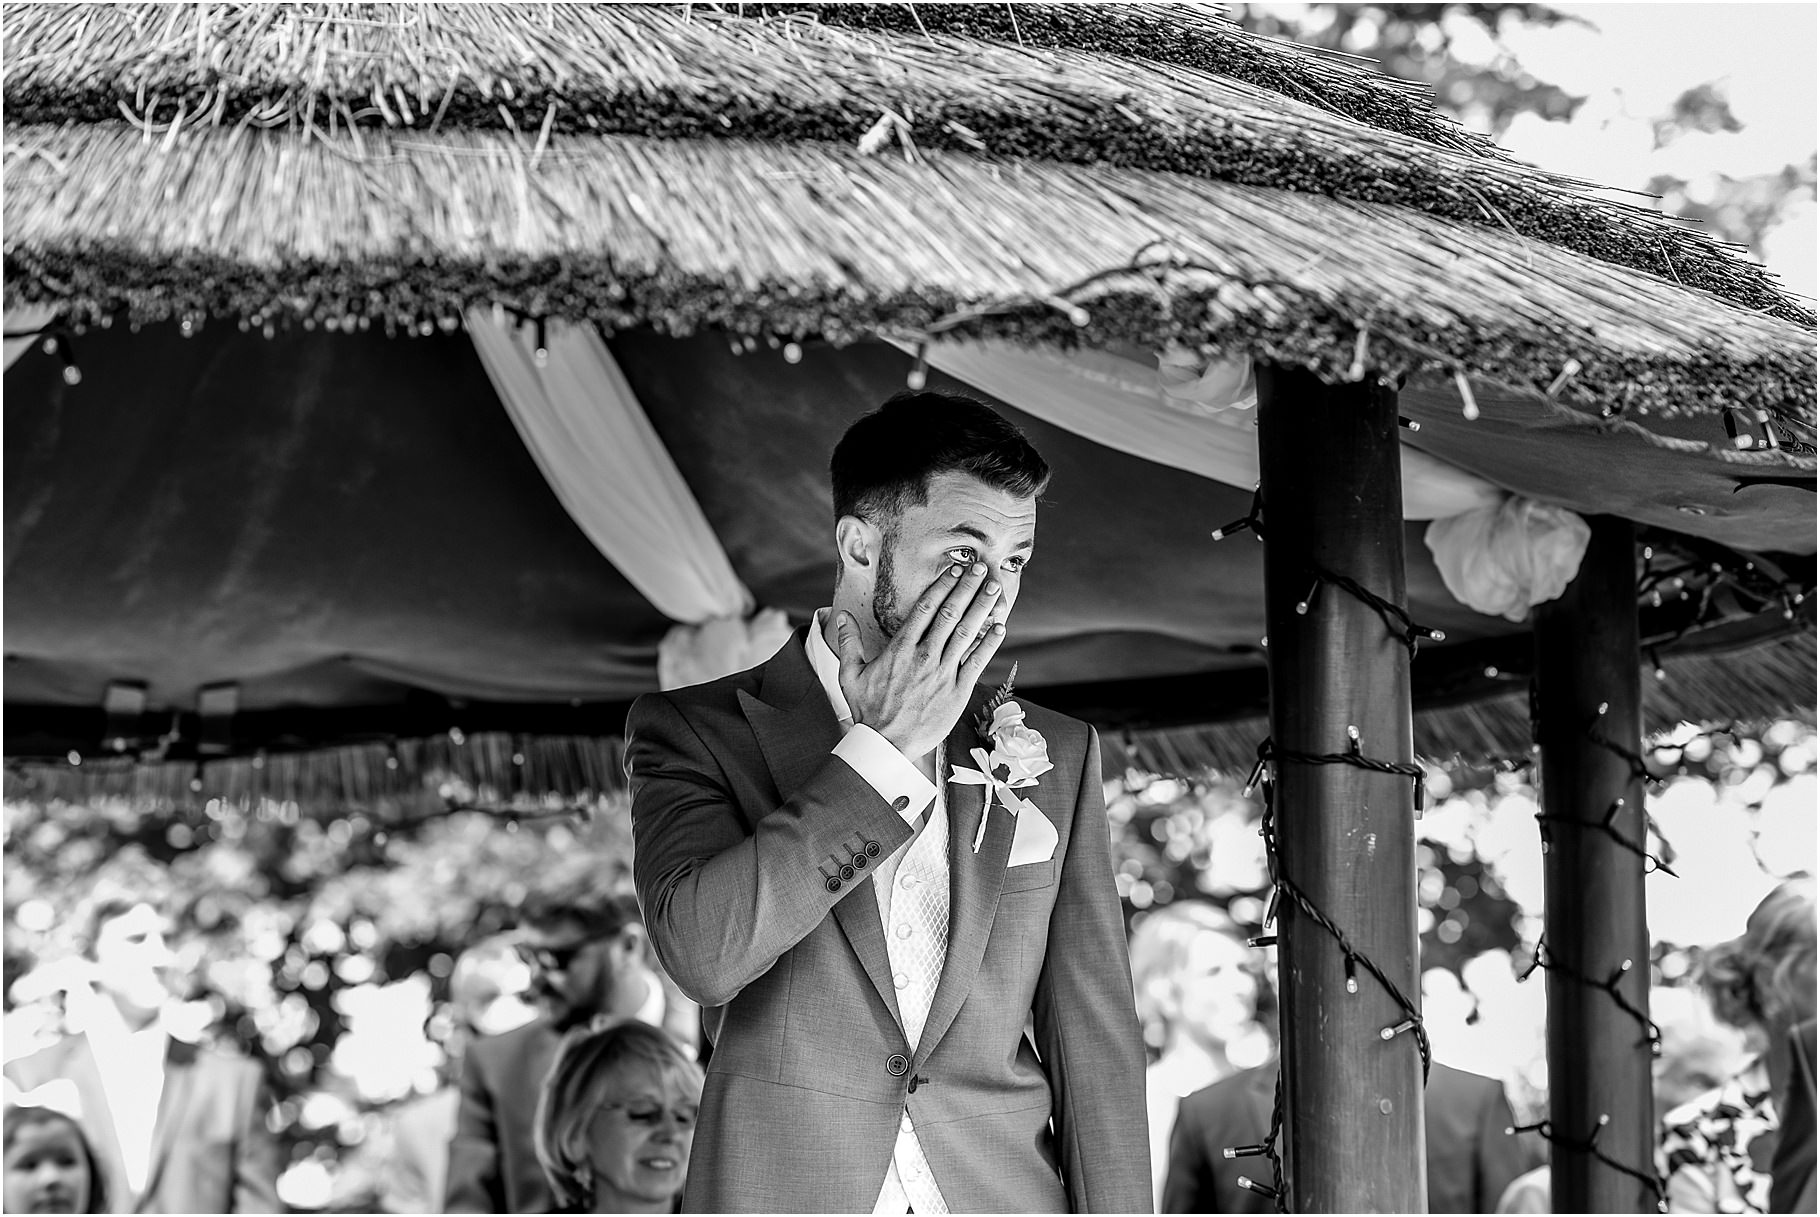 dan-wootton-photography-2017-weddings-062.jpg